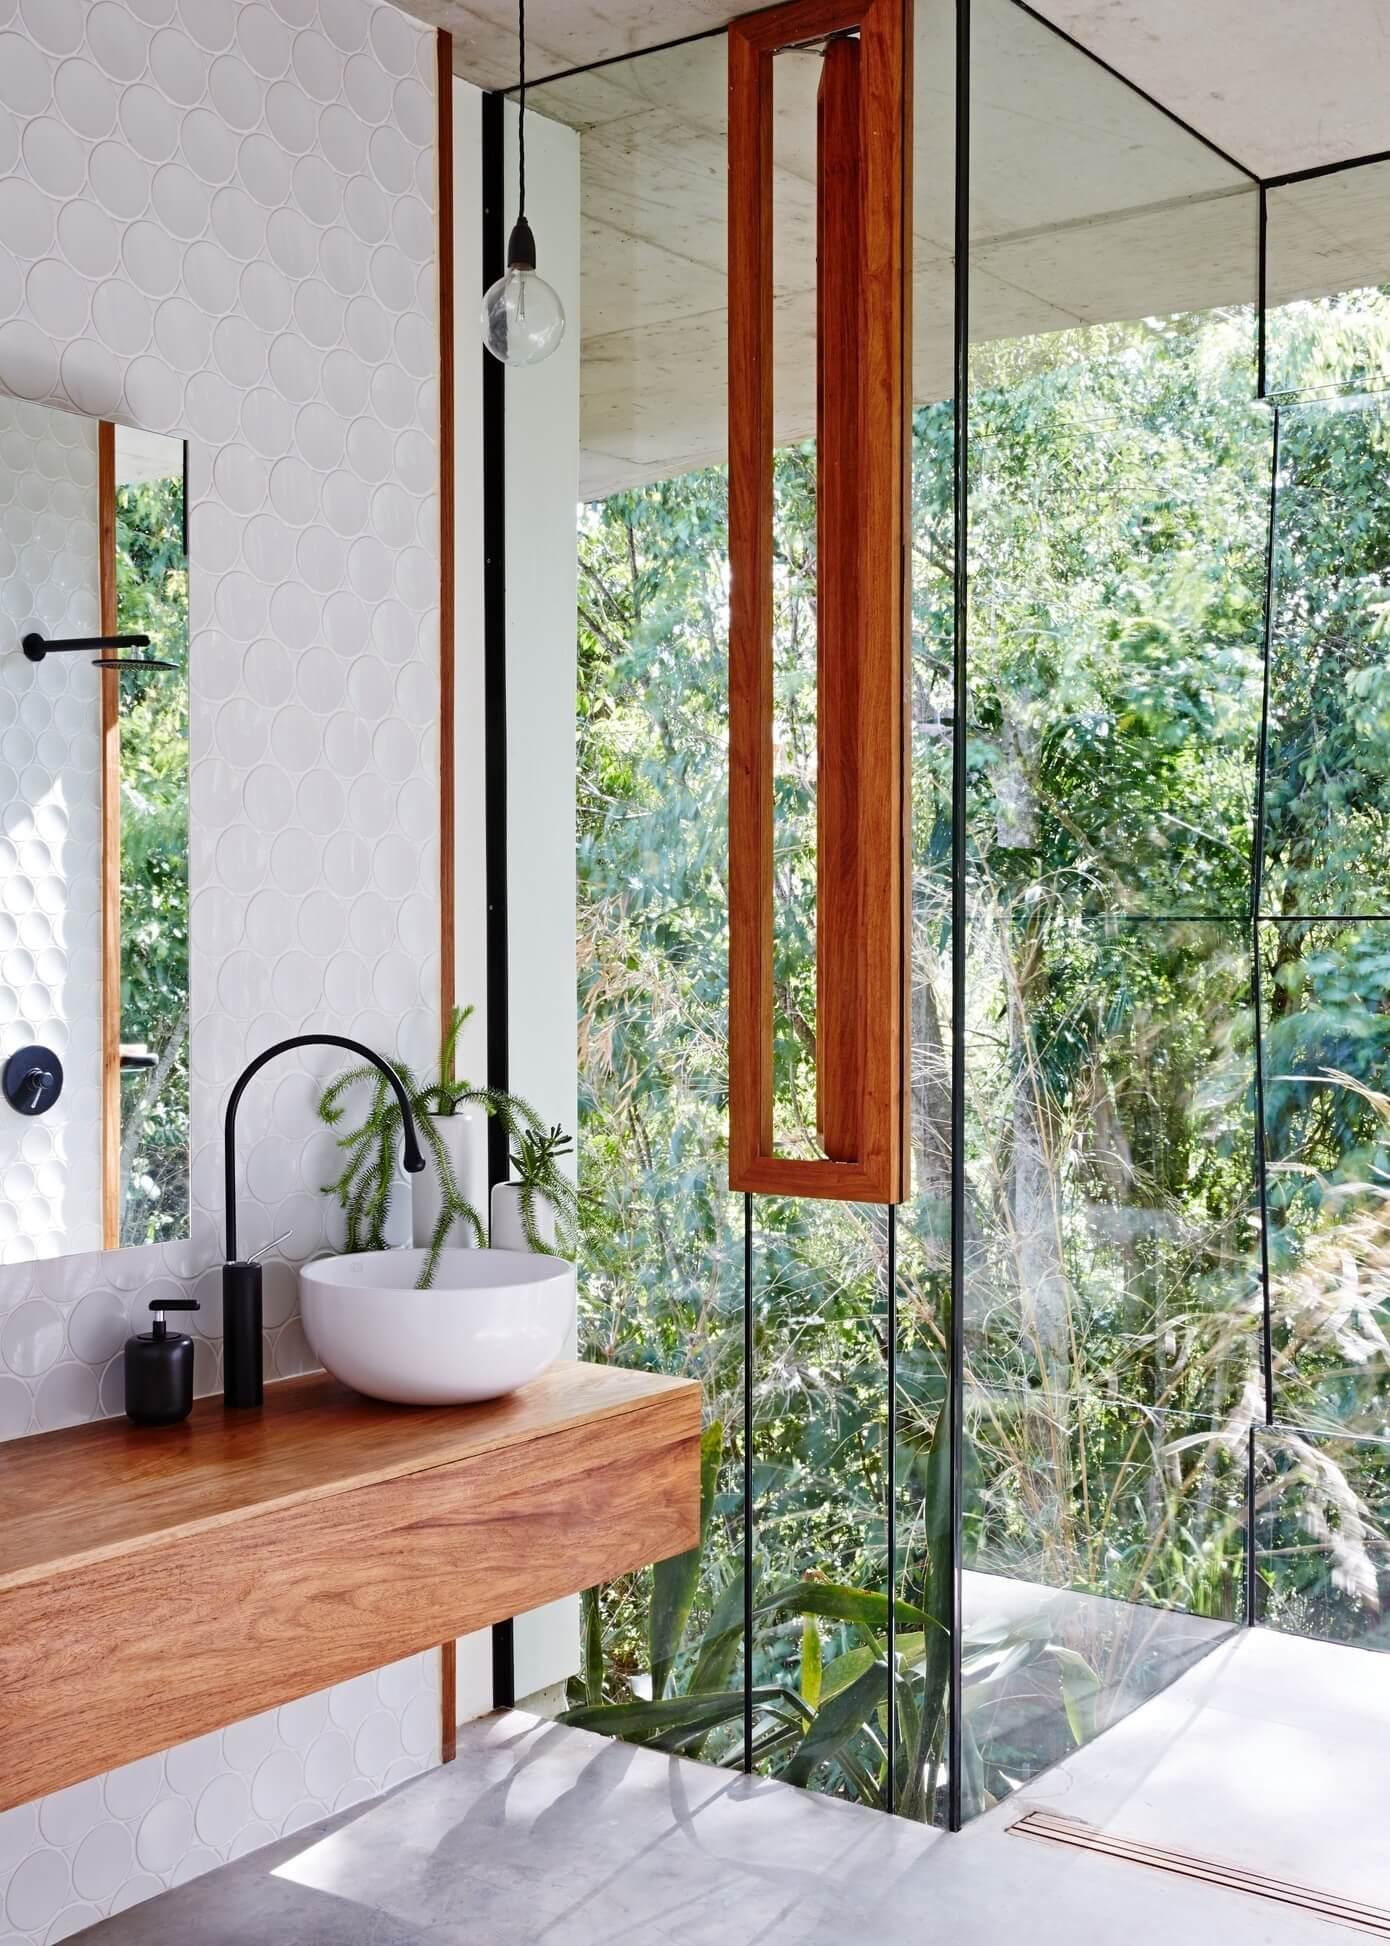 planchonella-house-jesse-bennett-architect-16